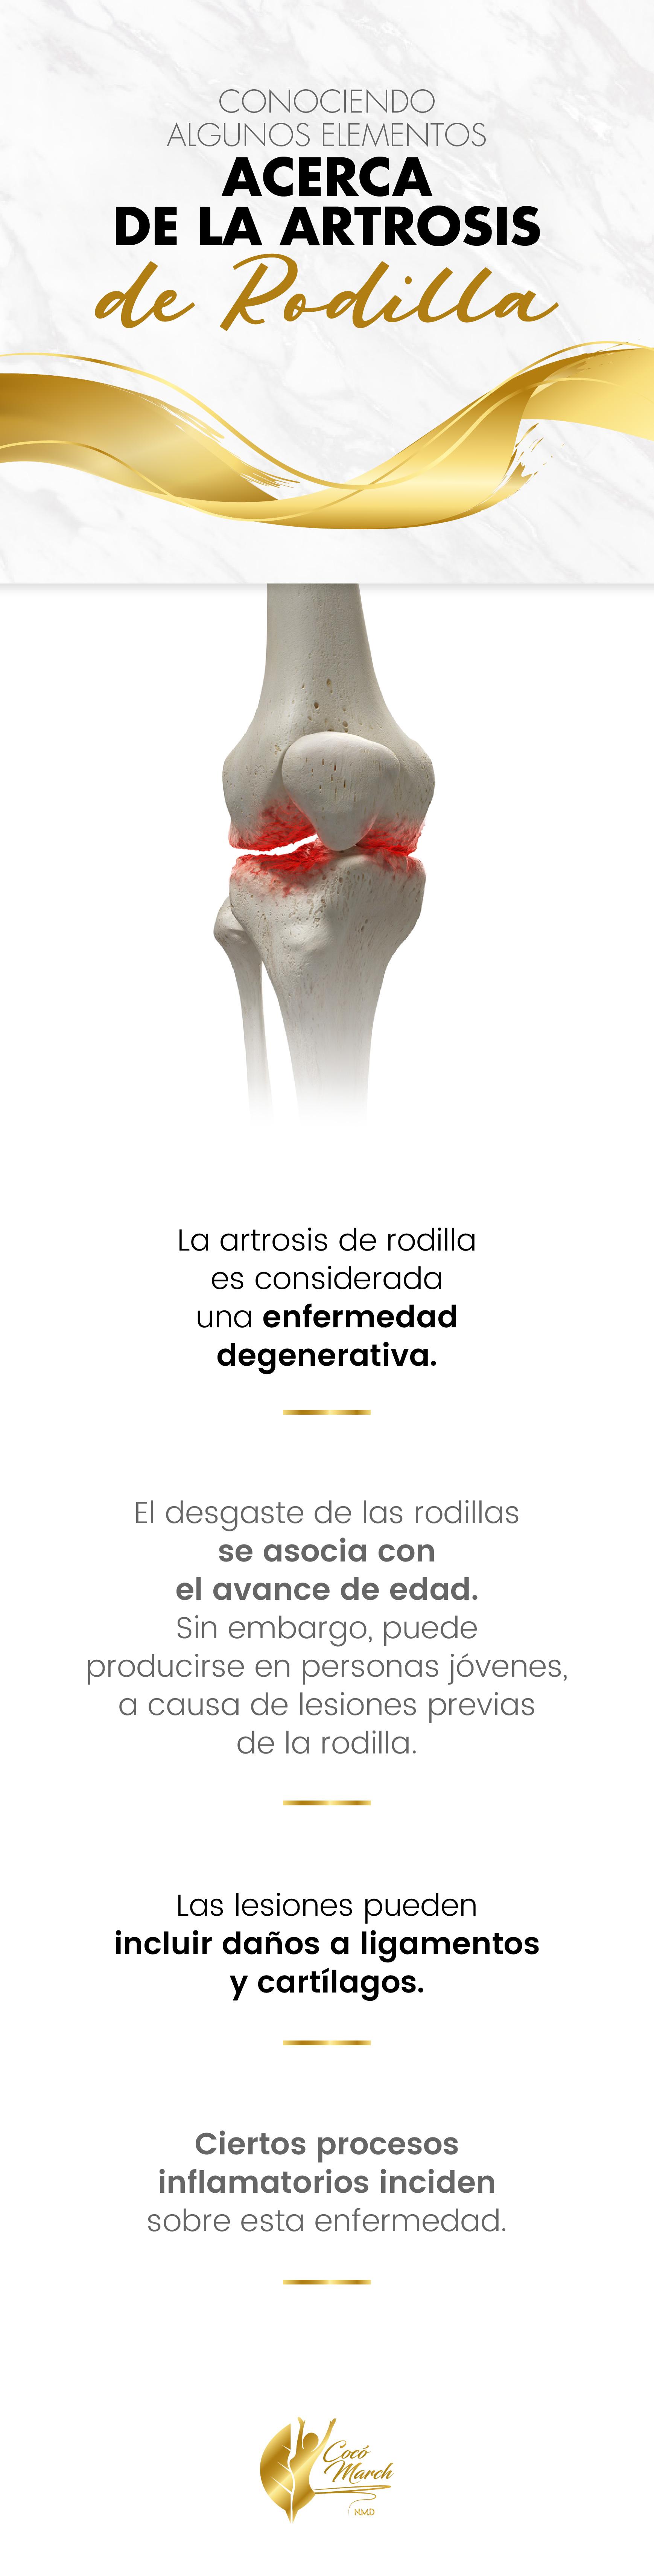 artrosis-de-rodilla